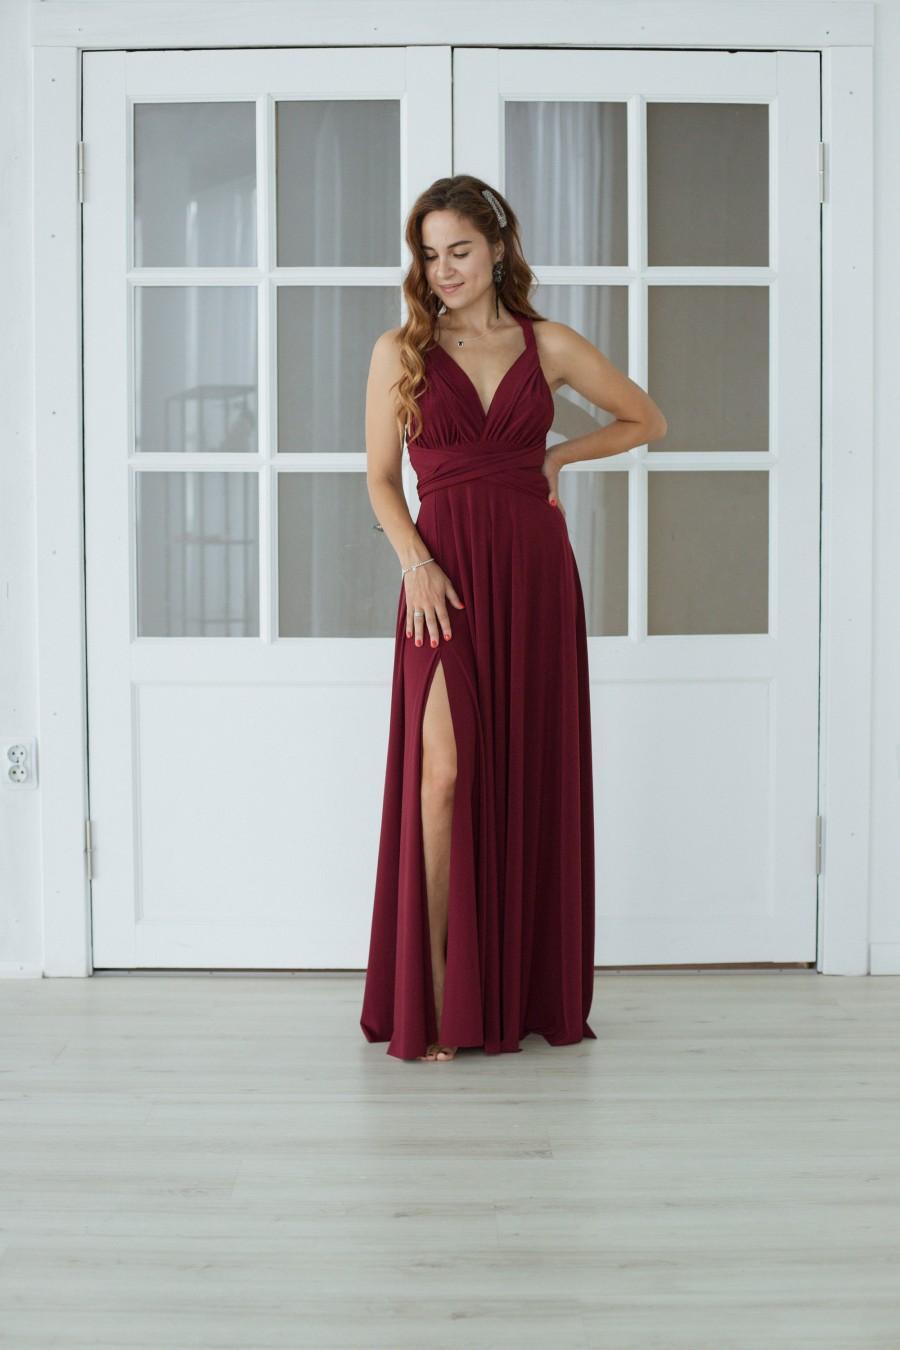 Wedding - Burgundy wine Bridesmaid dress with a slit, burgundy infinity dress with a slit, convertible dress with a slit, multiway dresswith a slit